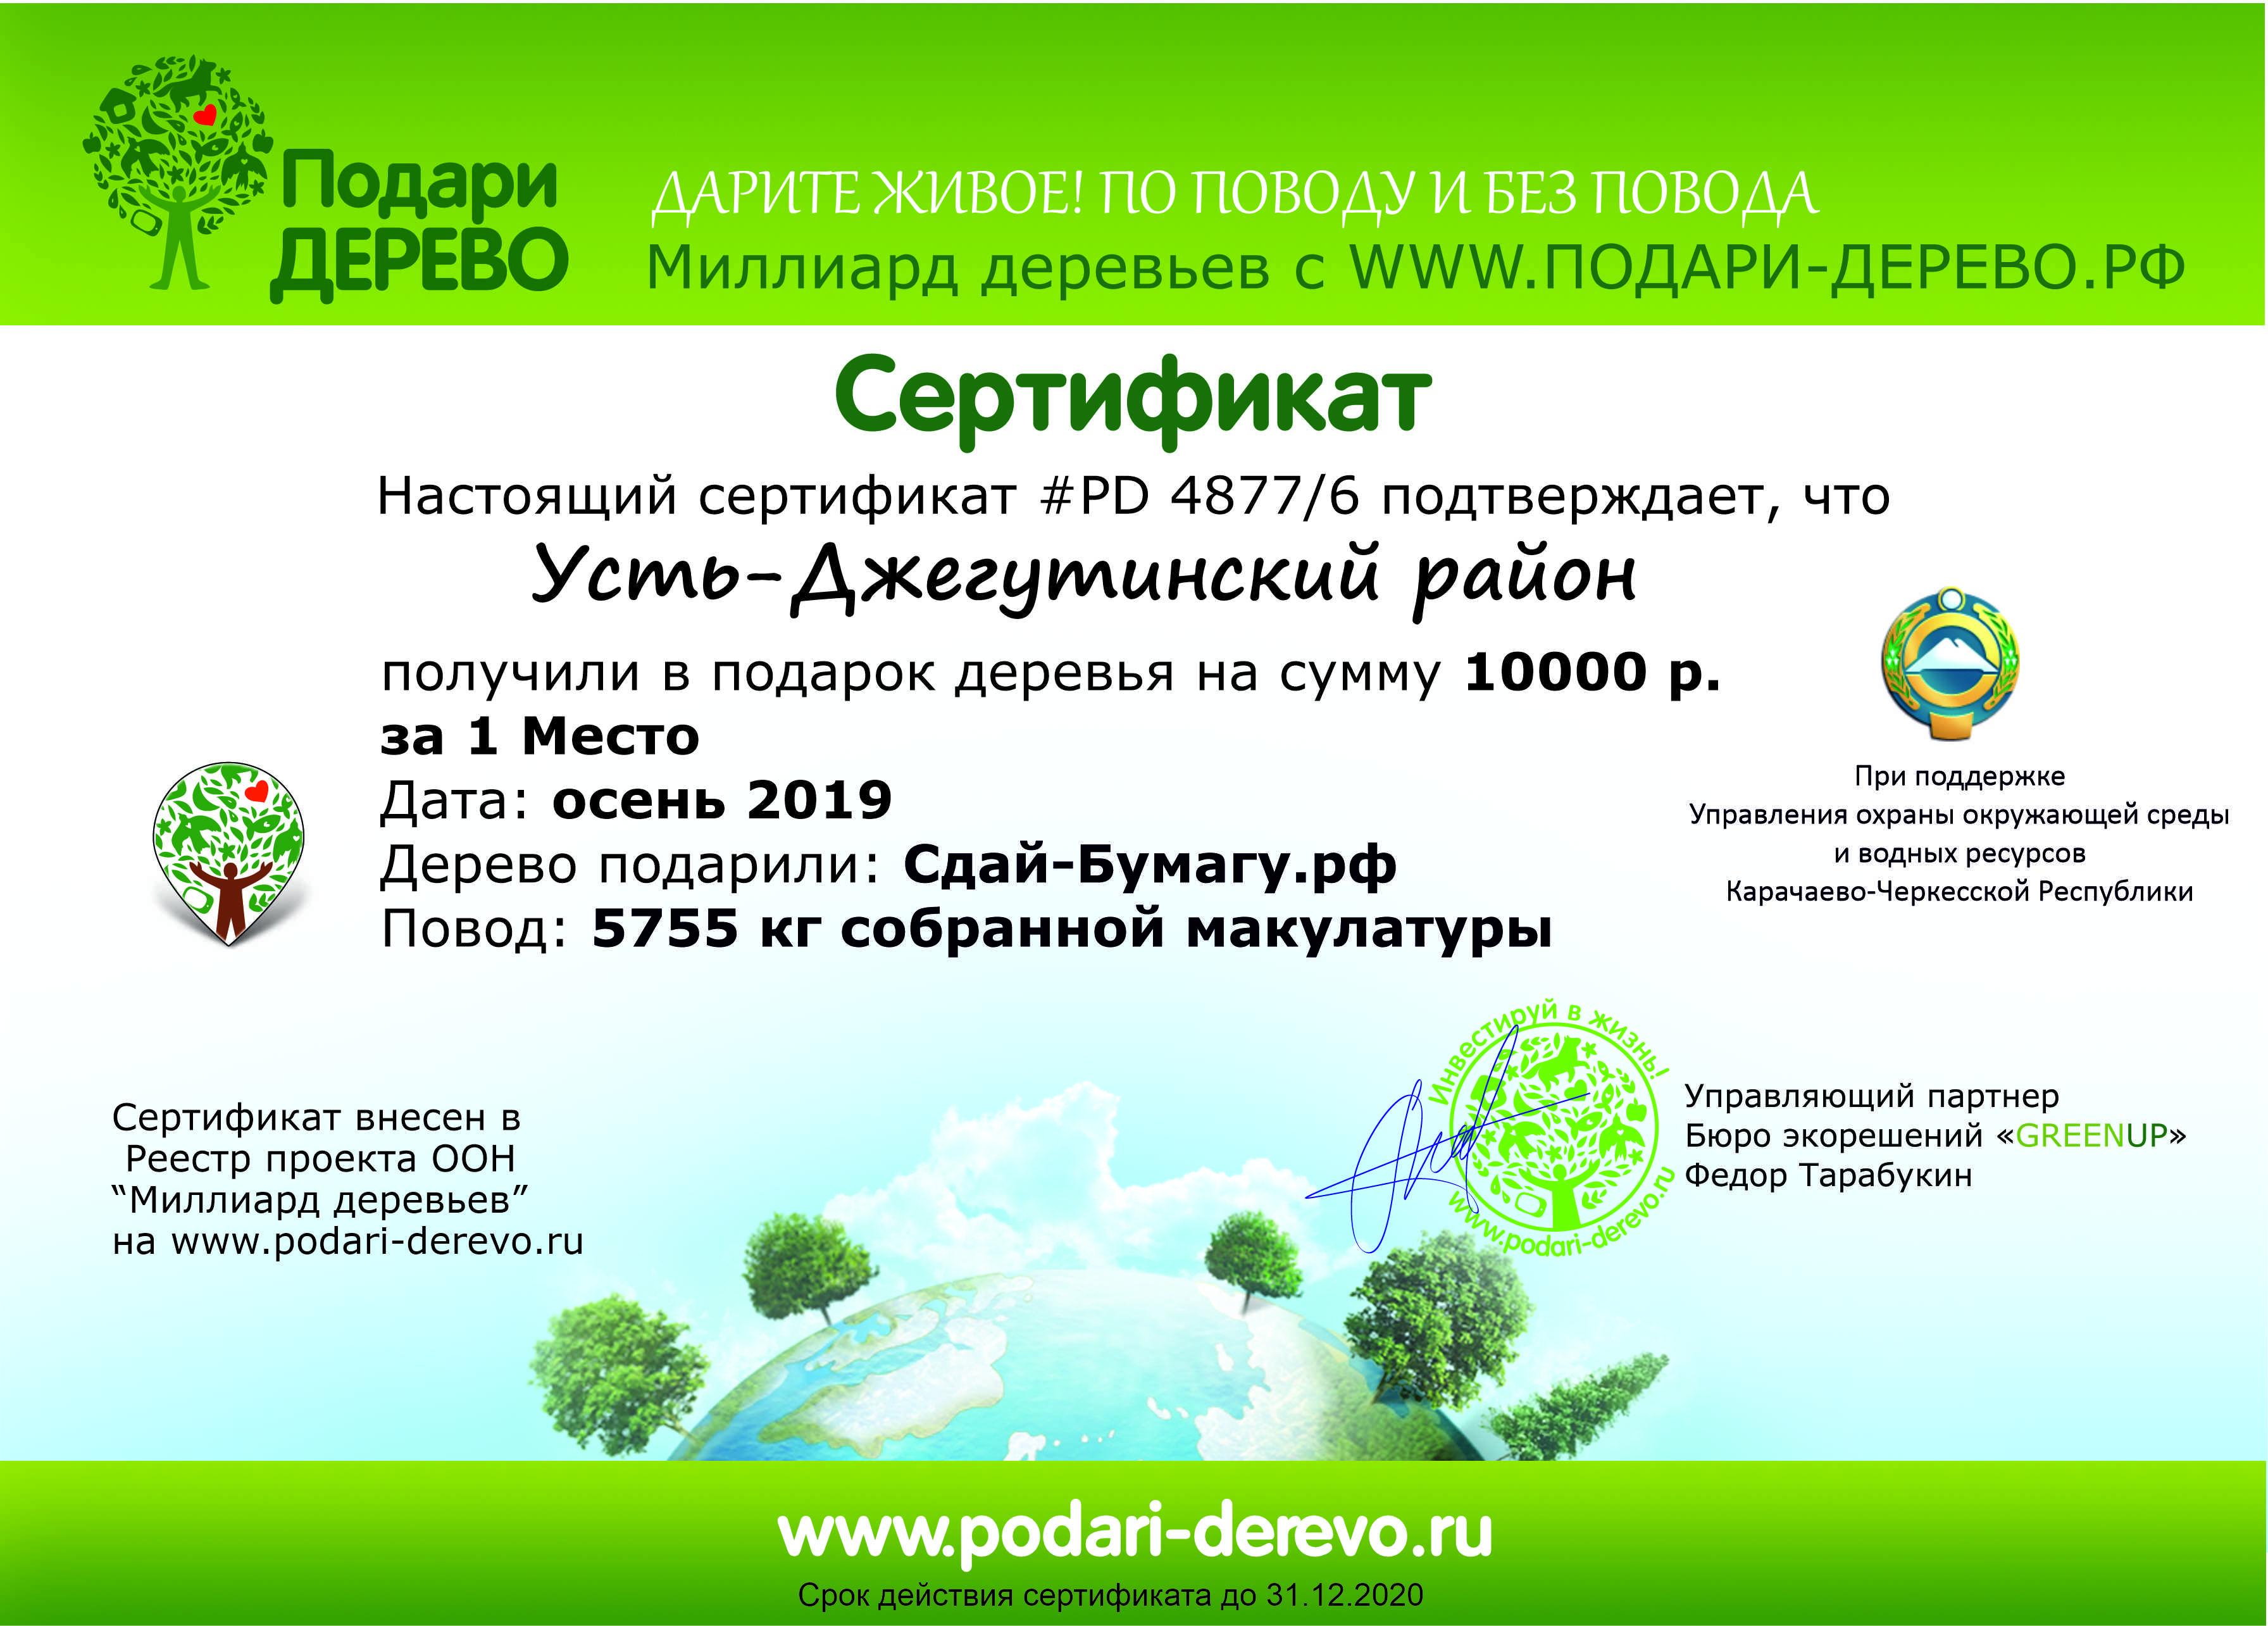 Всероссийский Эко-марафон переработка «Сдай макулатуру - спаси дерево»